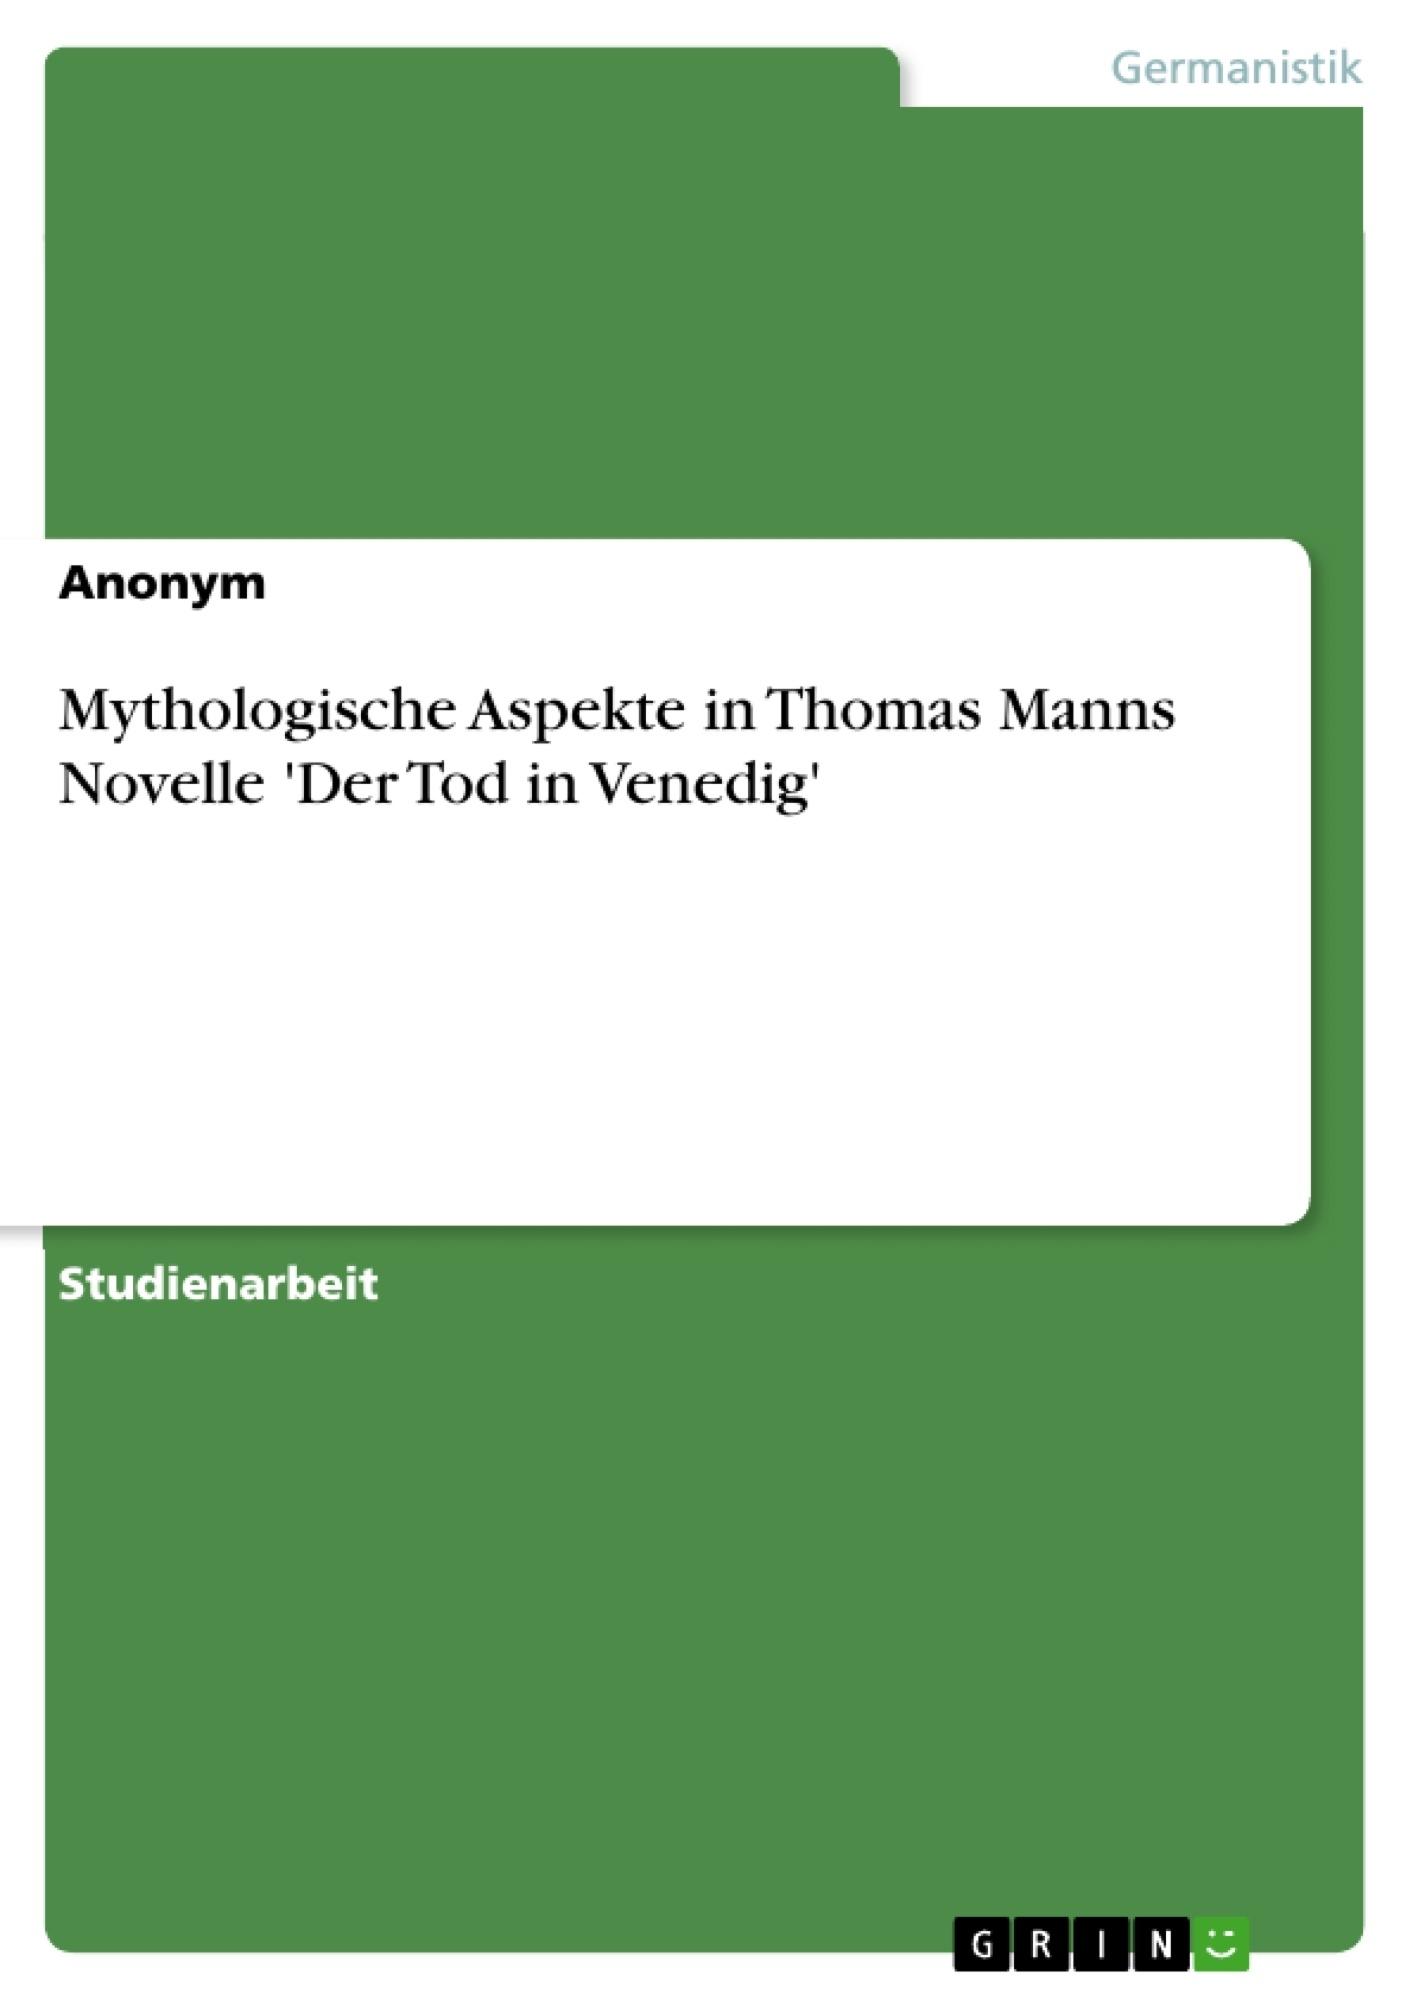 Titel: Mythologische Aspekte in Thomas Manns Novelle 'Der Tod in Venedig'